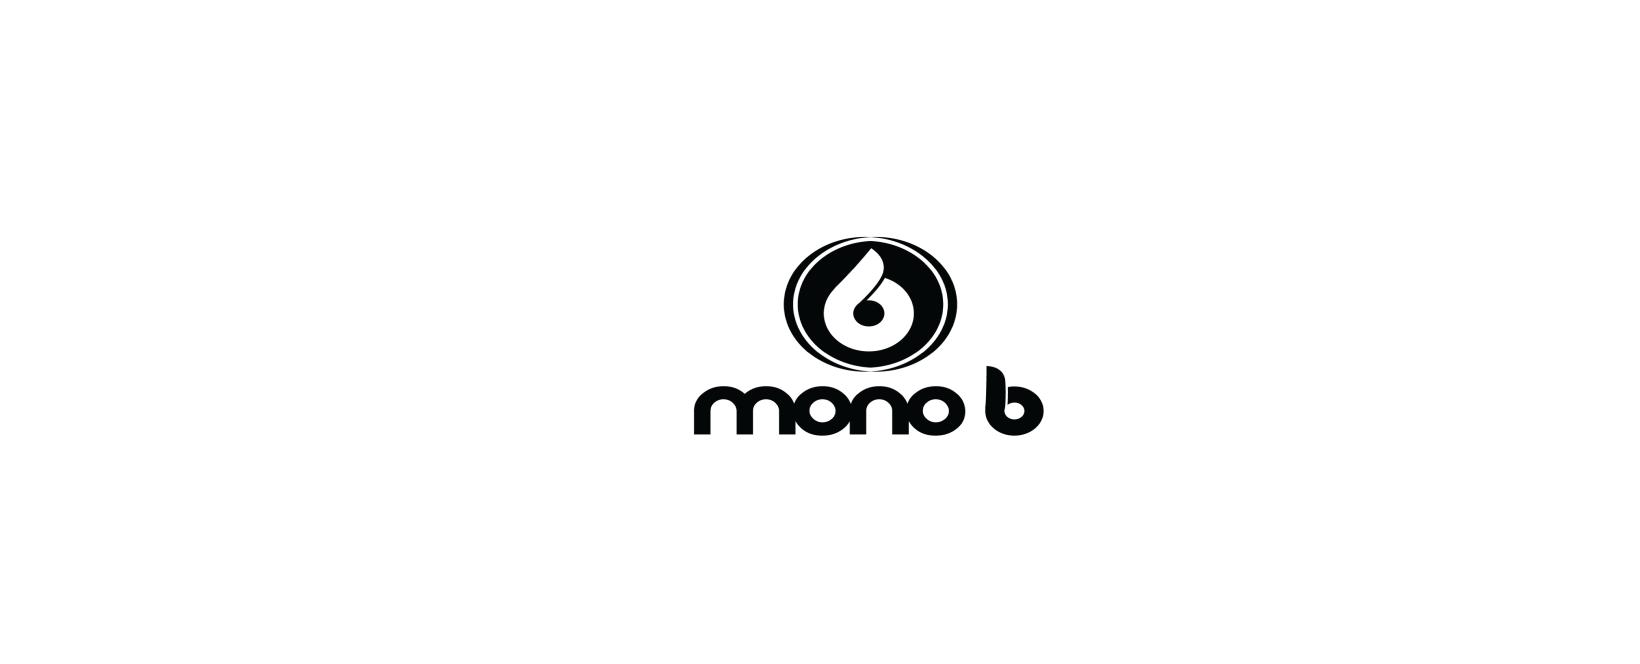 Mono B Discount Code 2021